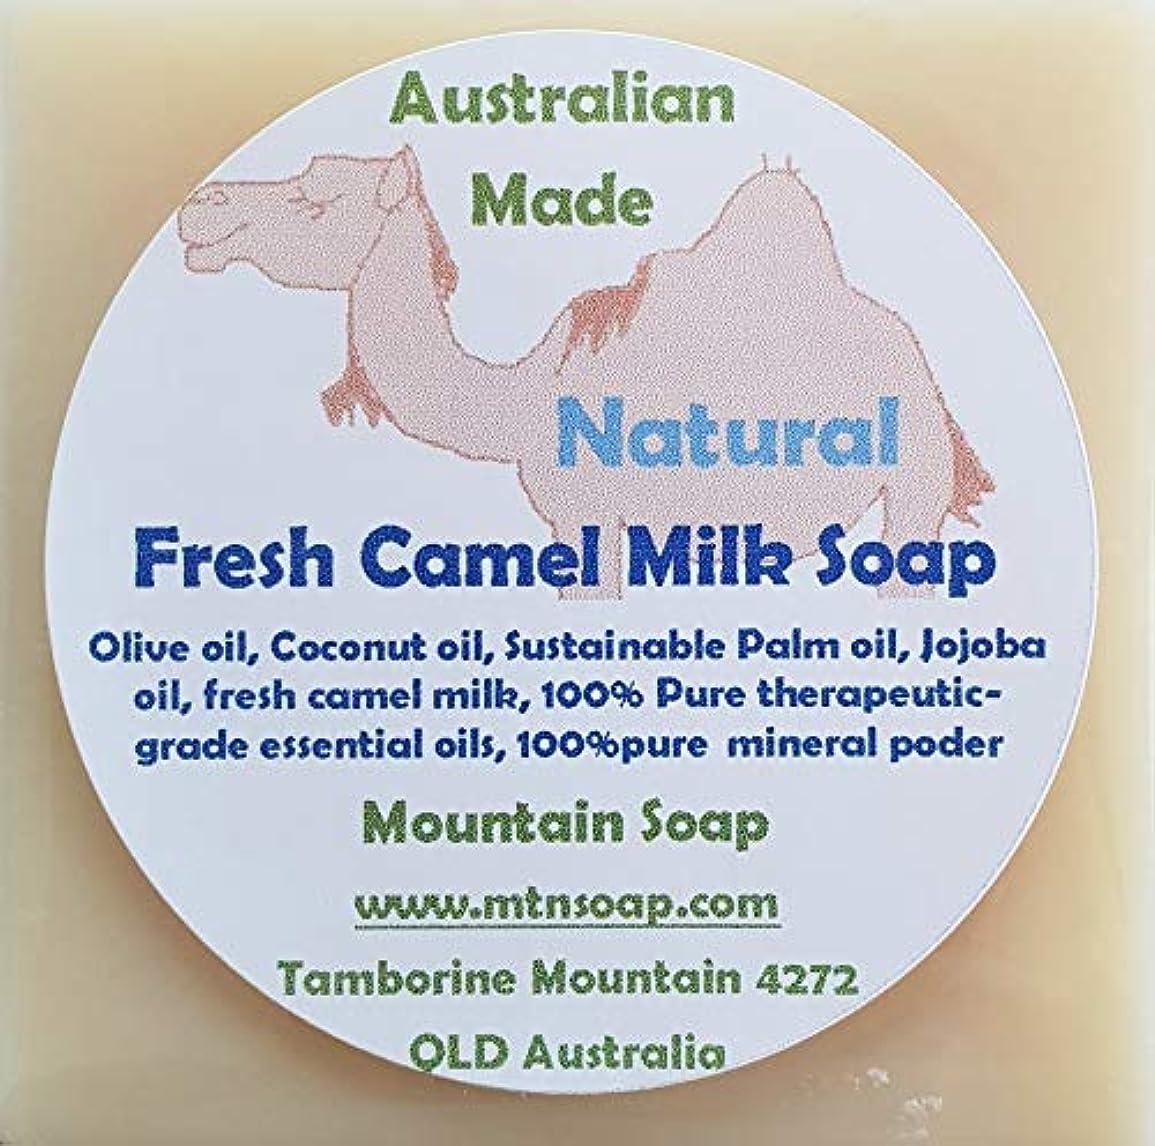 【Mountain Soap】マウンテンソープ 農場直送絞りたて生乳使用 キャメルミルク石鹸 CAMEL MILK キャメルミルクソープ ラクダミルク石鹸 (ナチュラル(無香料))